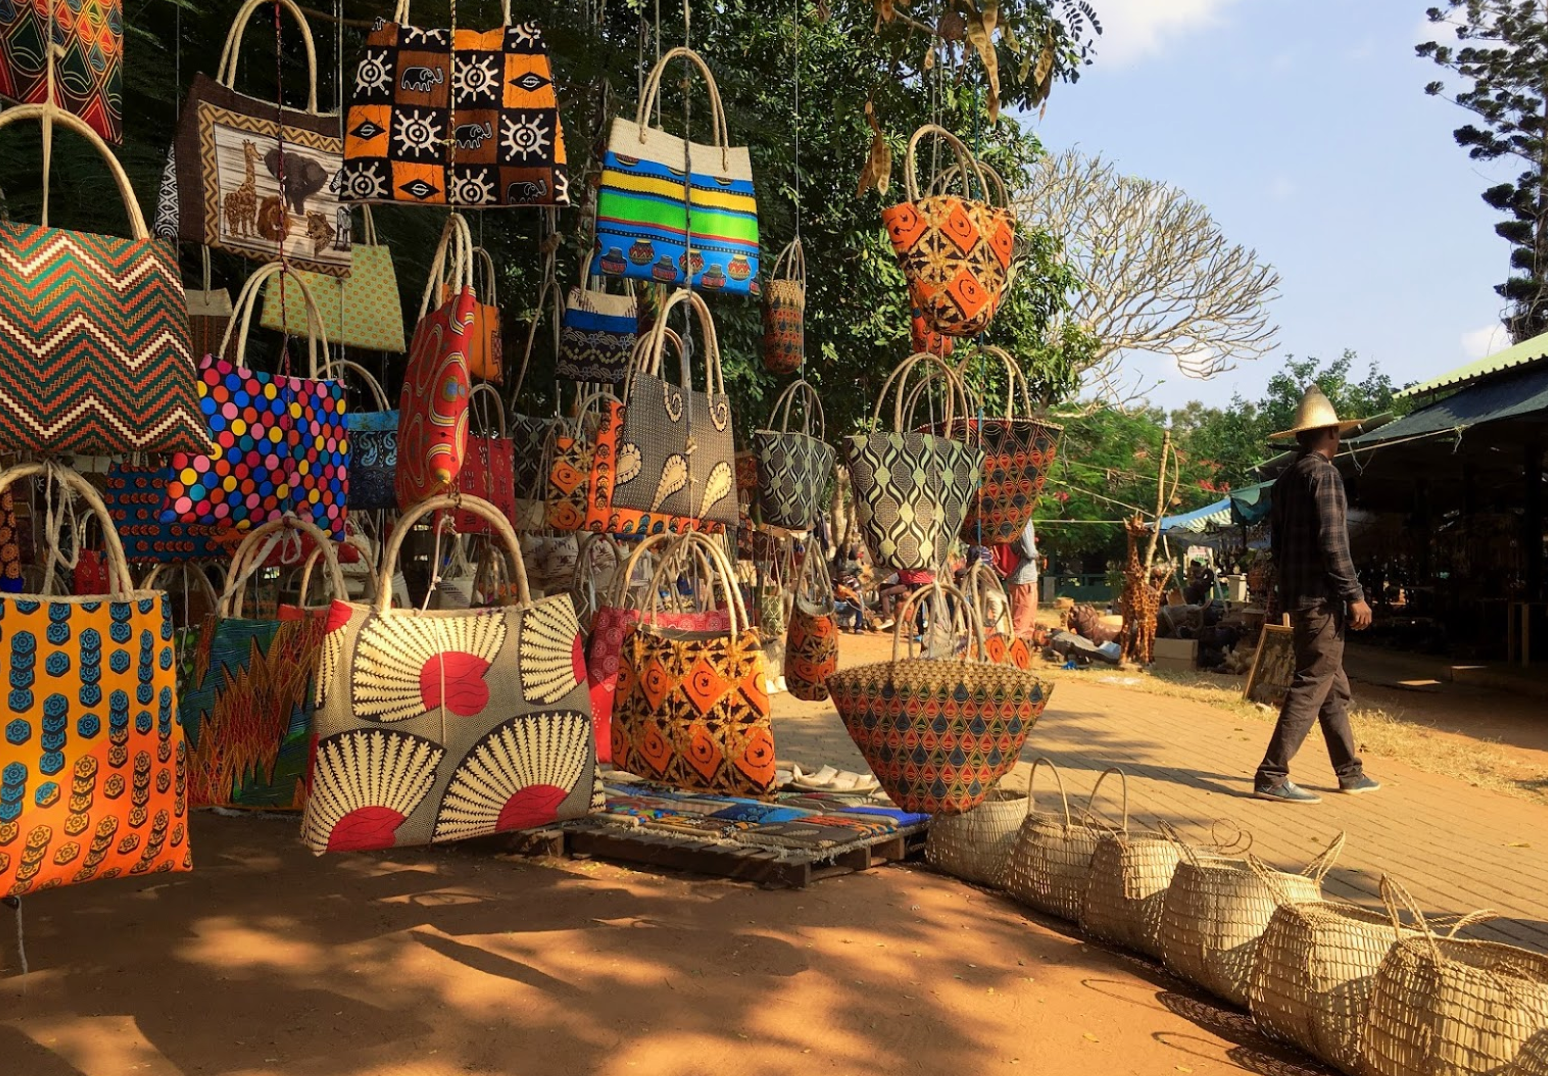 fairground in Maputo